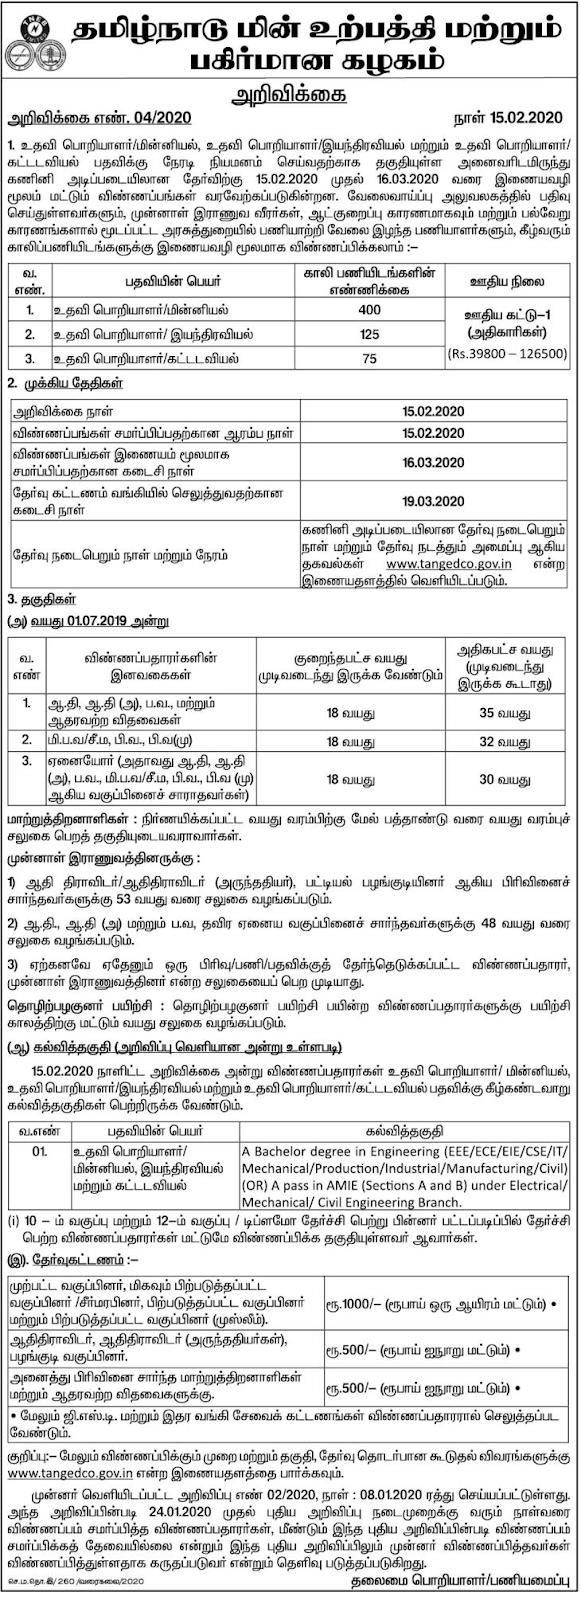 TNEB Assistant Engineer Recruitment 2020 - 600 Posts Vacancy